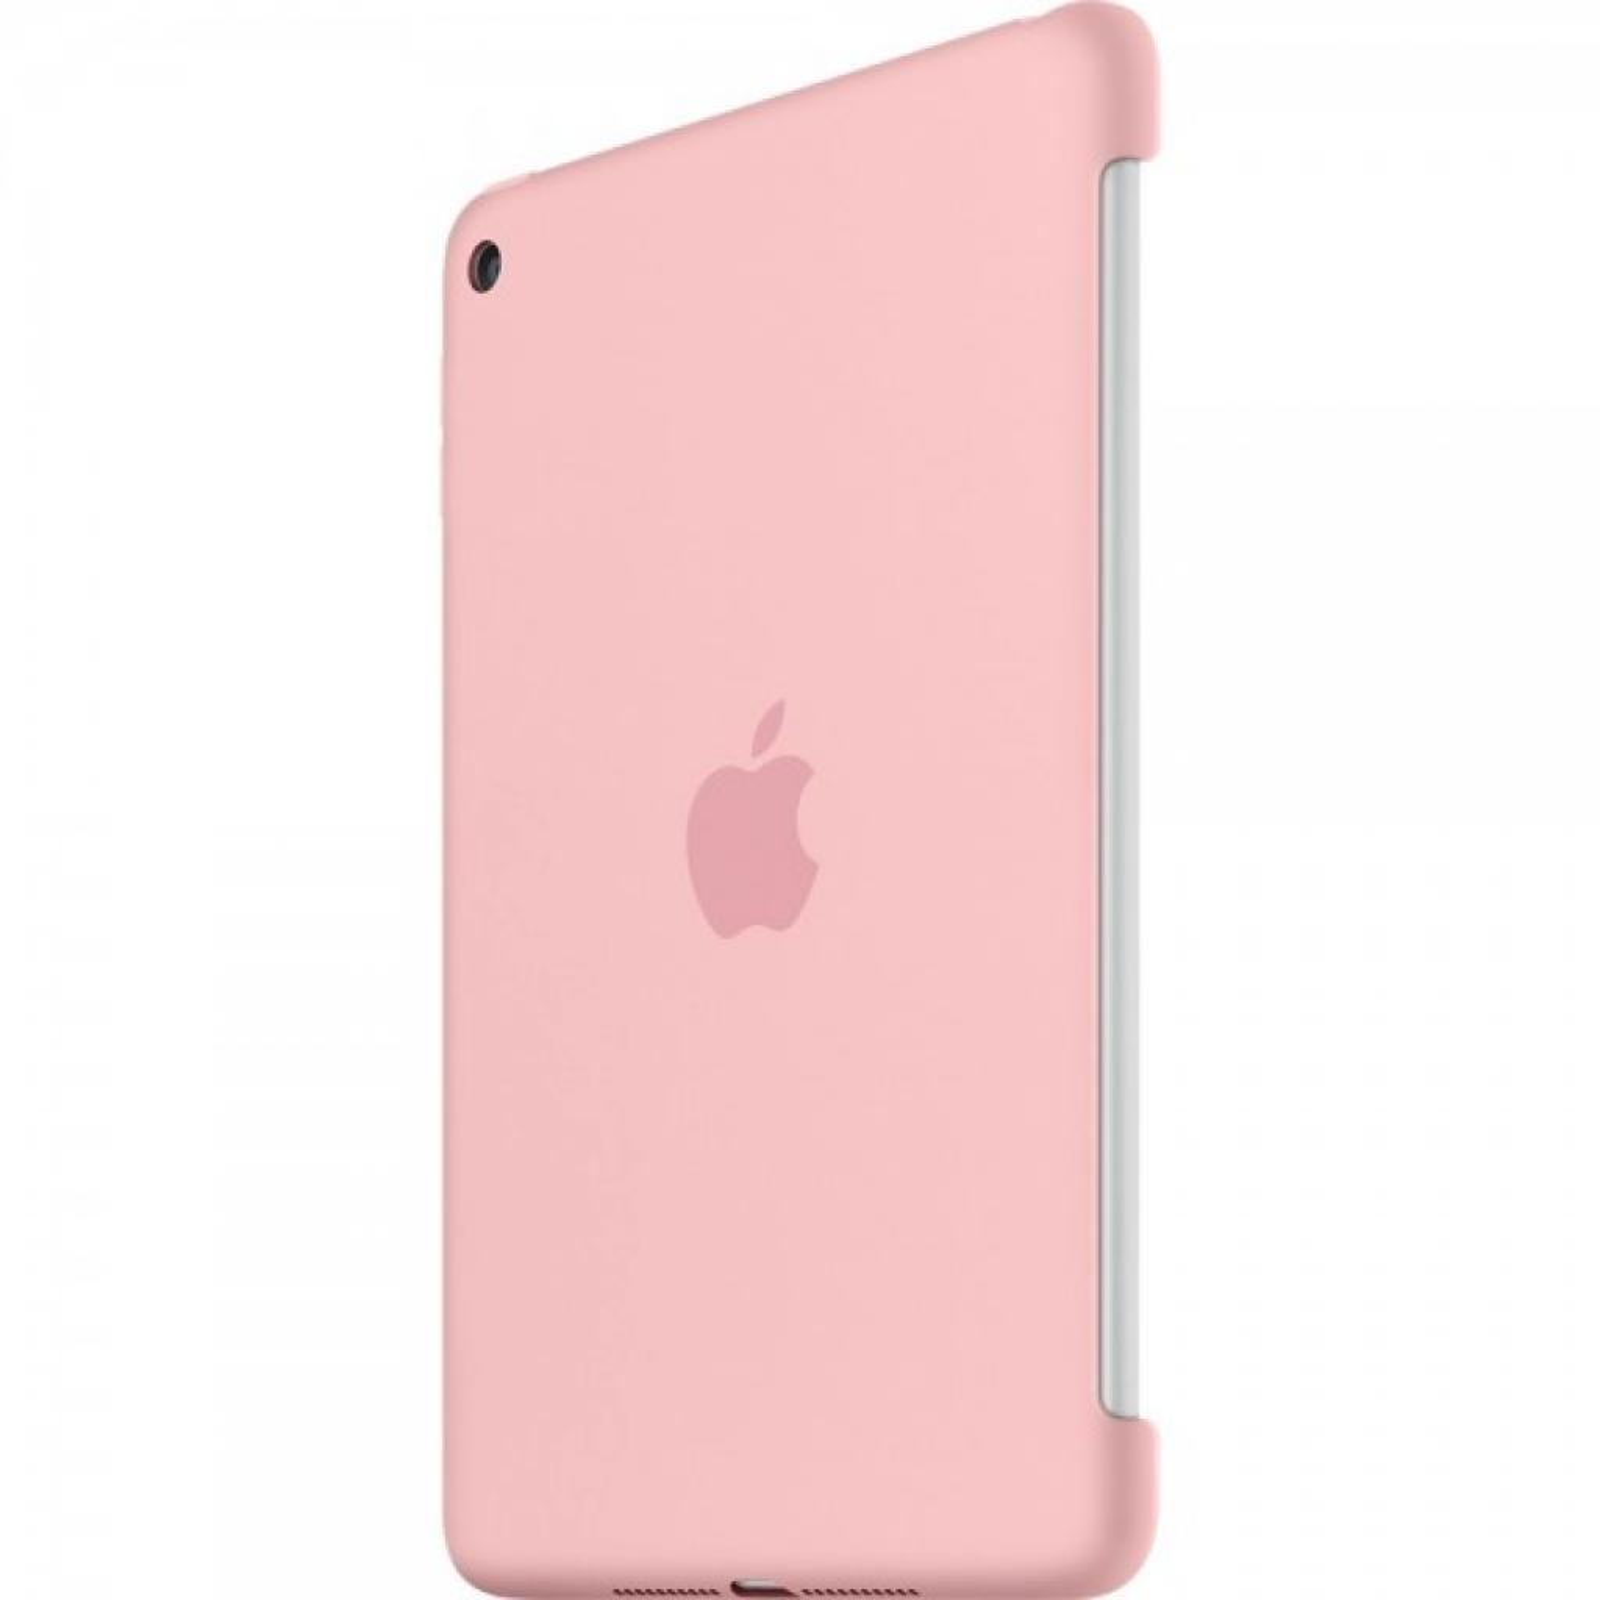 Чехол для планшета Apple iPad mini 4 Pink (MLD52ZM/A) изображение 2